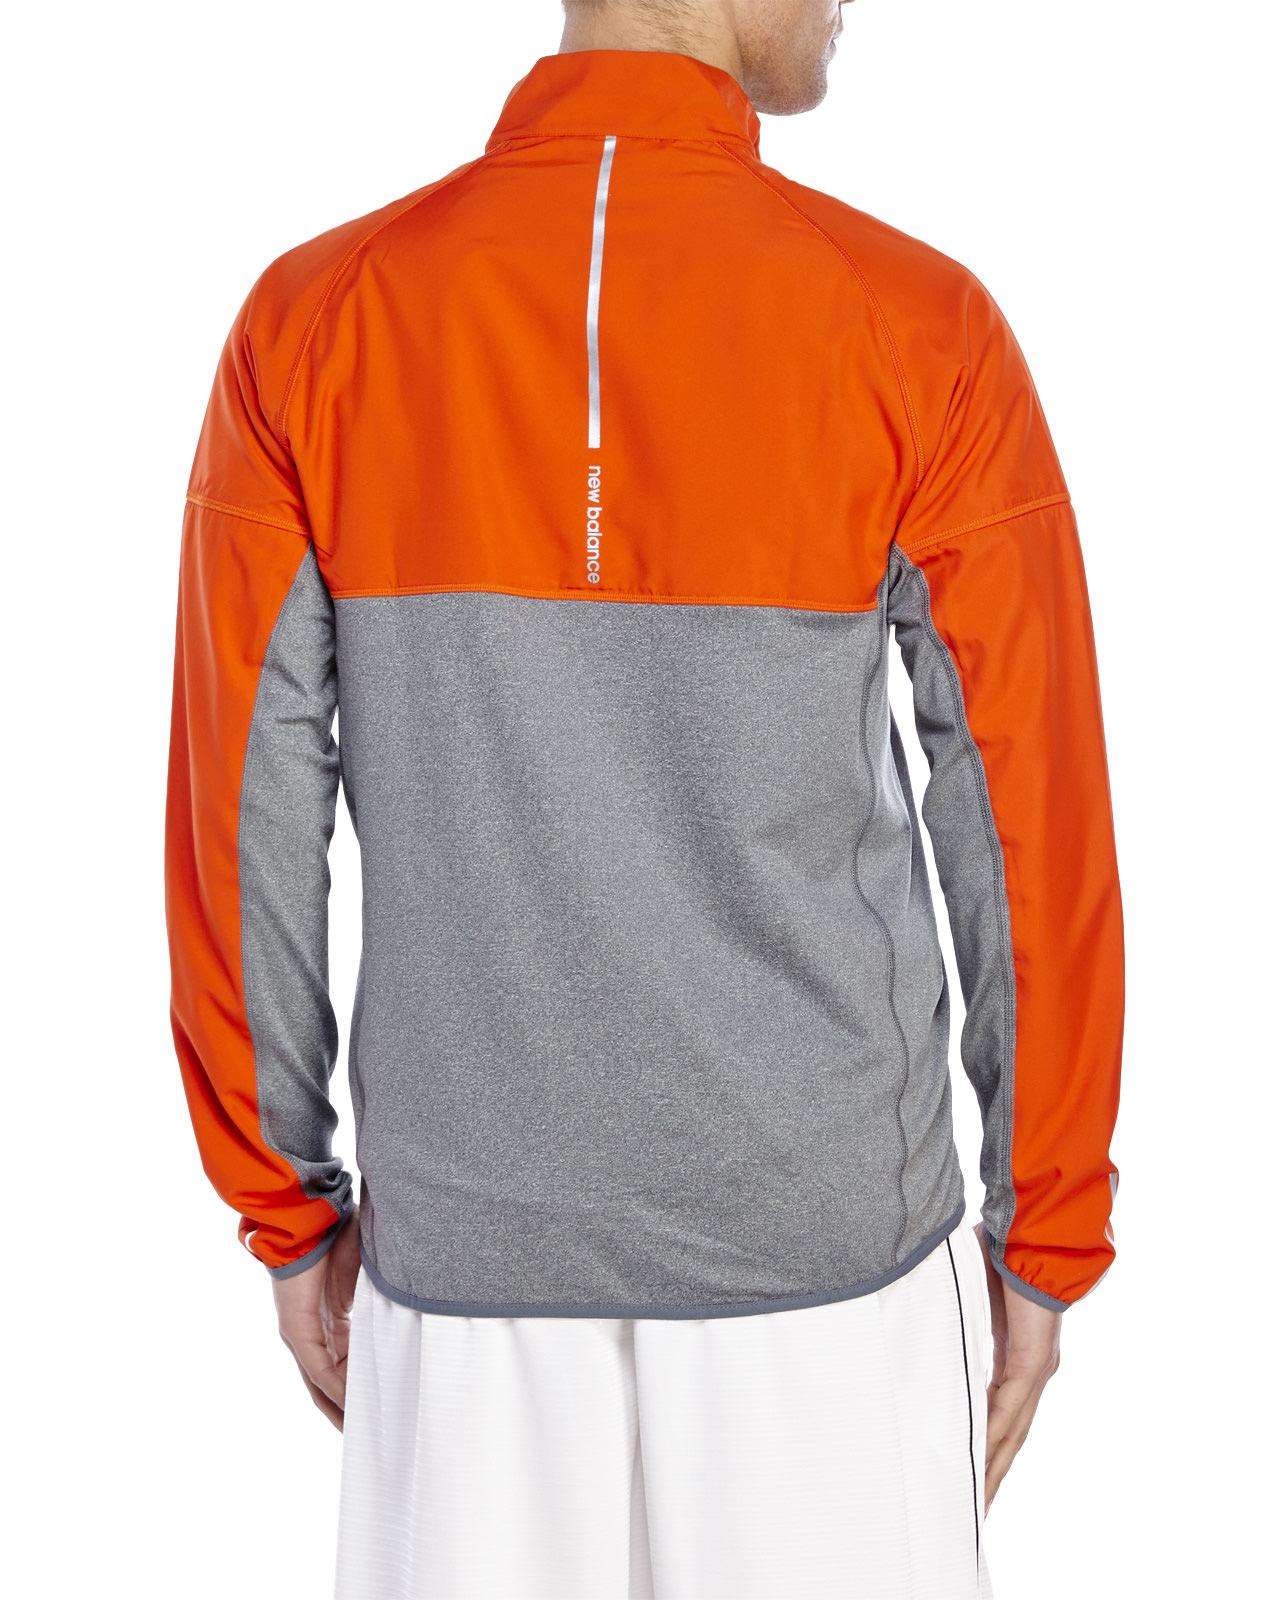 90e96cea79a84 New Balance Raptor Jacket in Orange for Men - Lyst